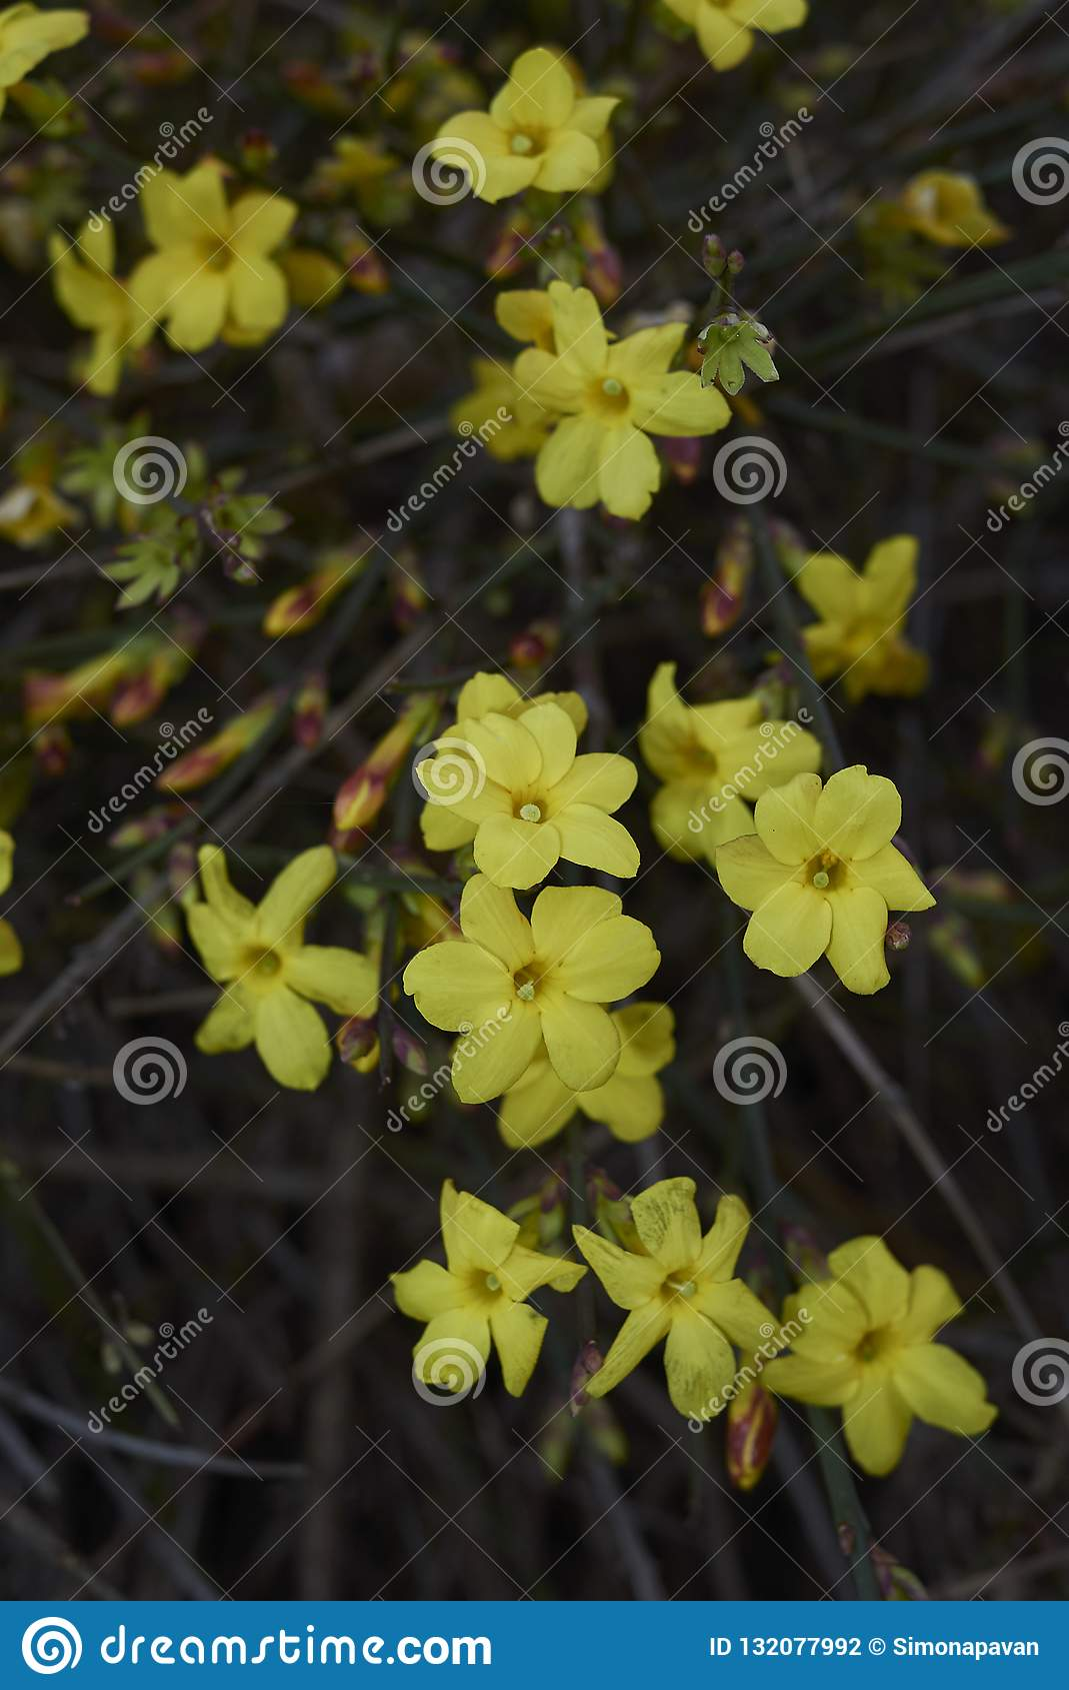 Yellow Flowers Close Up Of Jasminum Nudiflorum Stock Photo Image